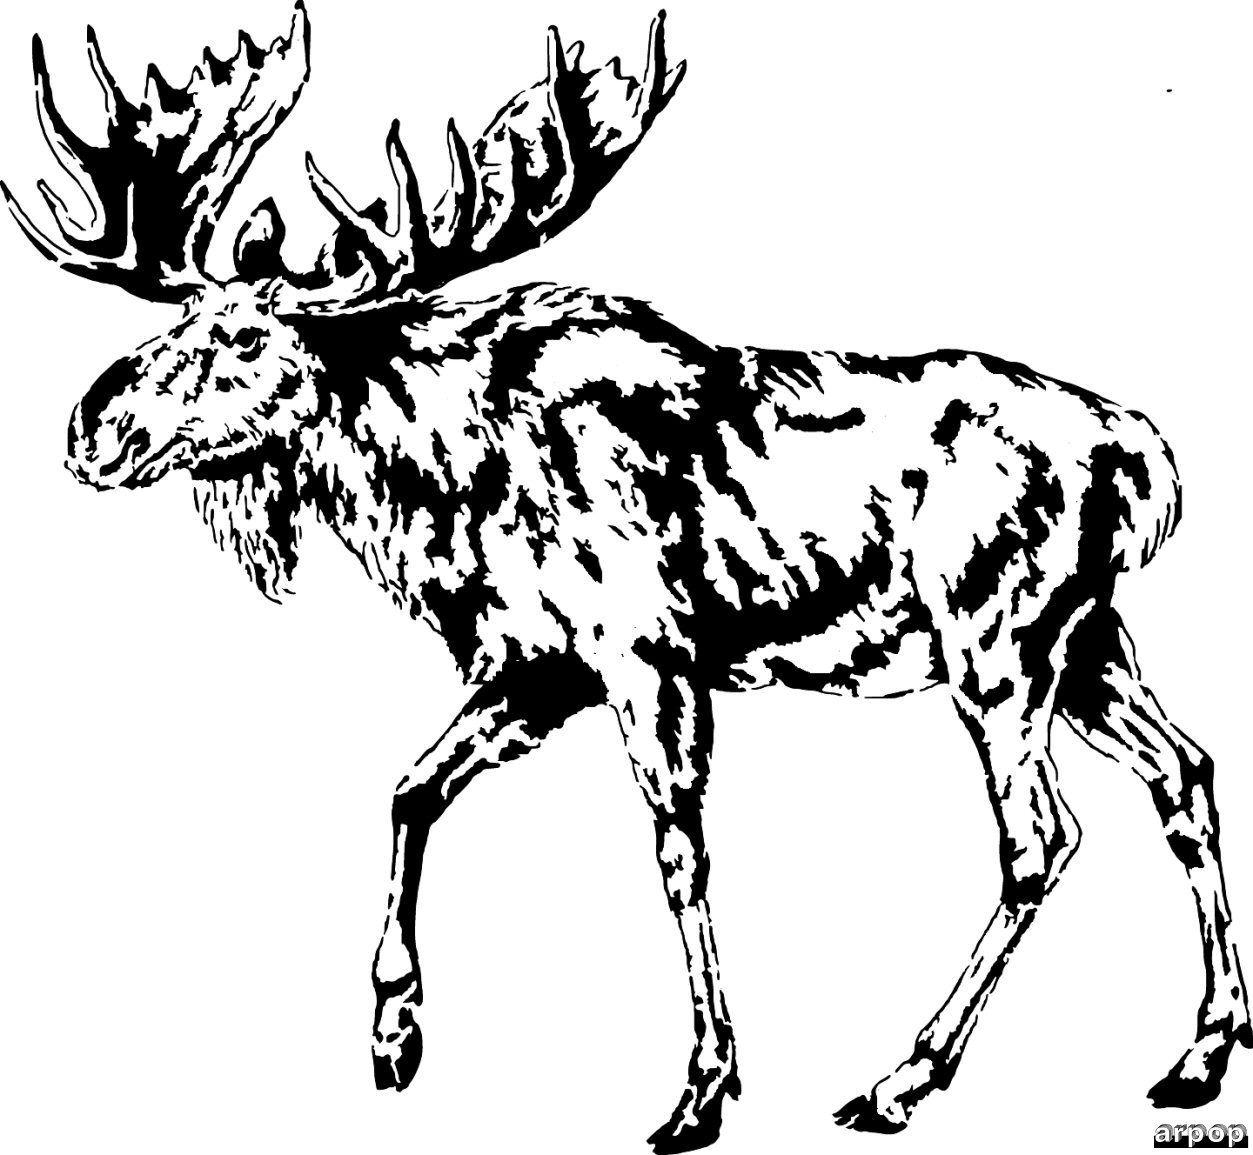 Free scroll saw patterns by arpop moose scroll saw